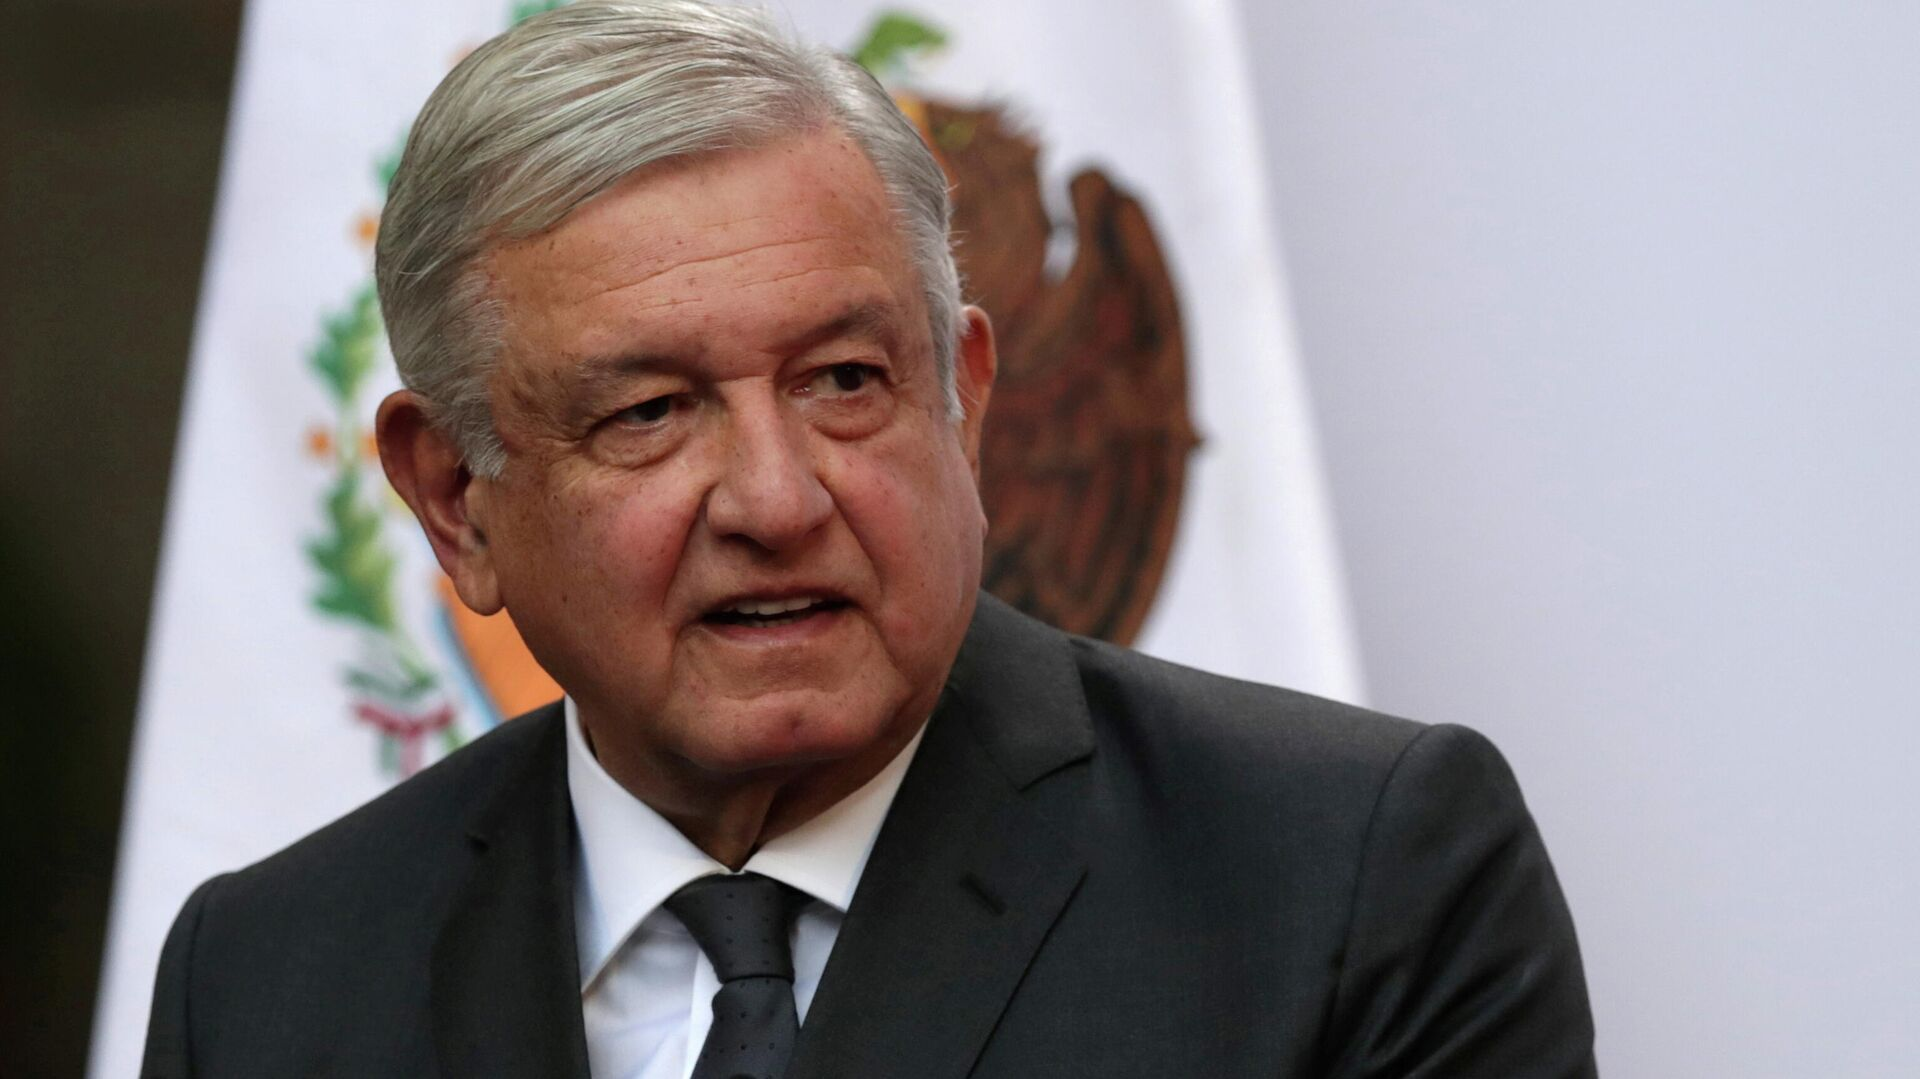 El presidente de México, Andrés Manuel López Obrador - Sputnik Mundo, 1920, 25.03.2021